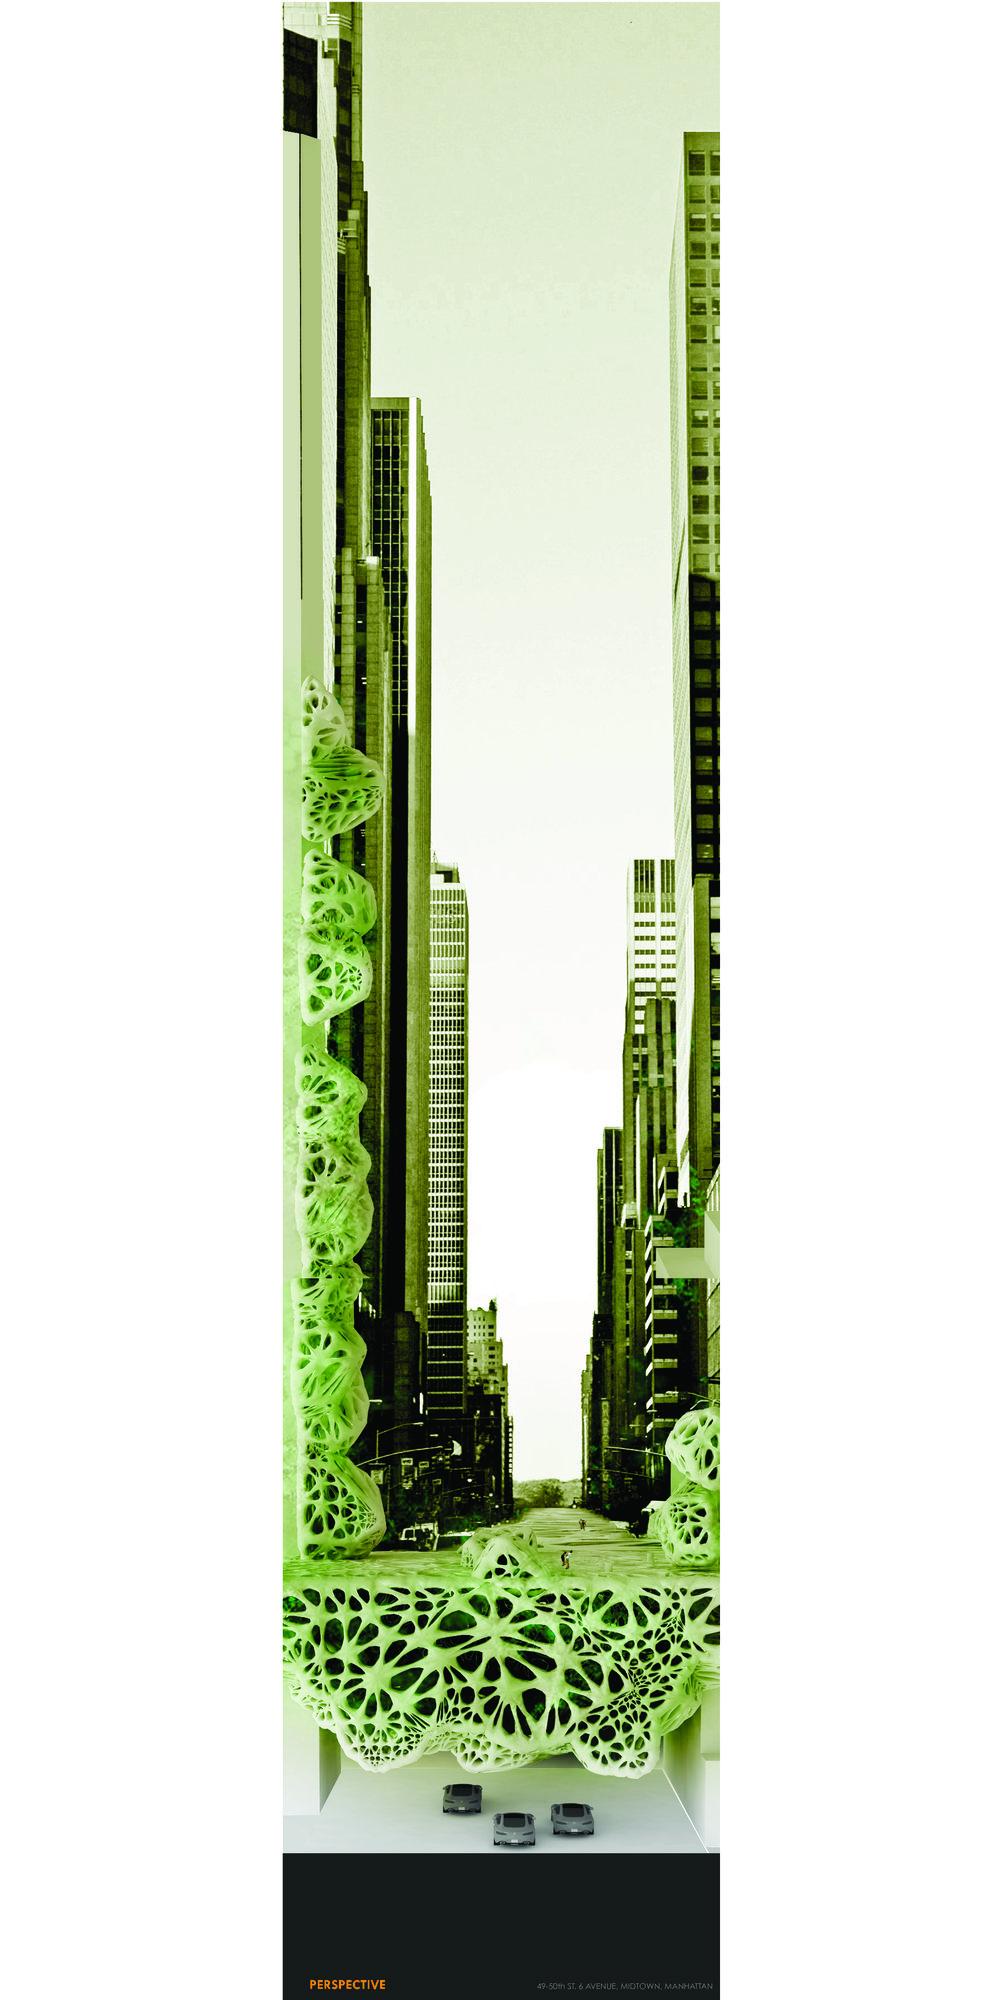 Futuristic carbon-neutral city scenario